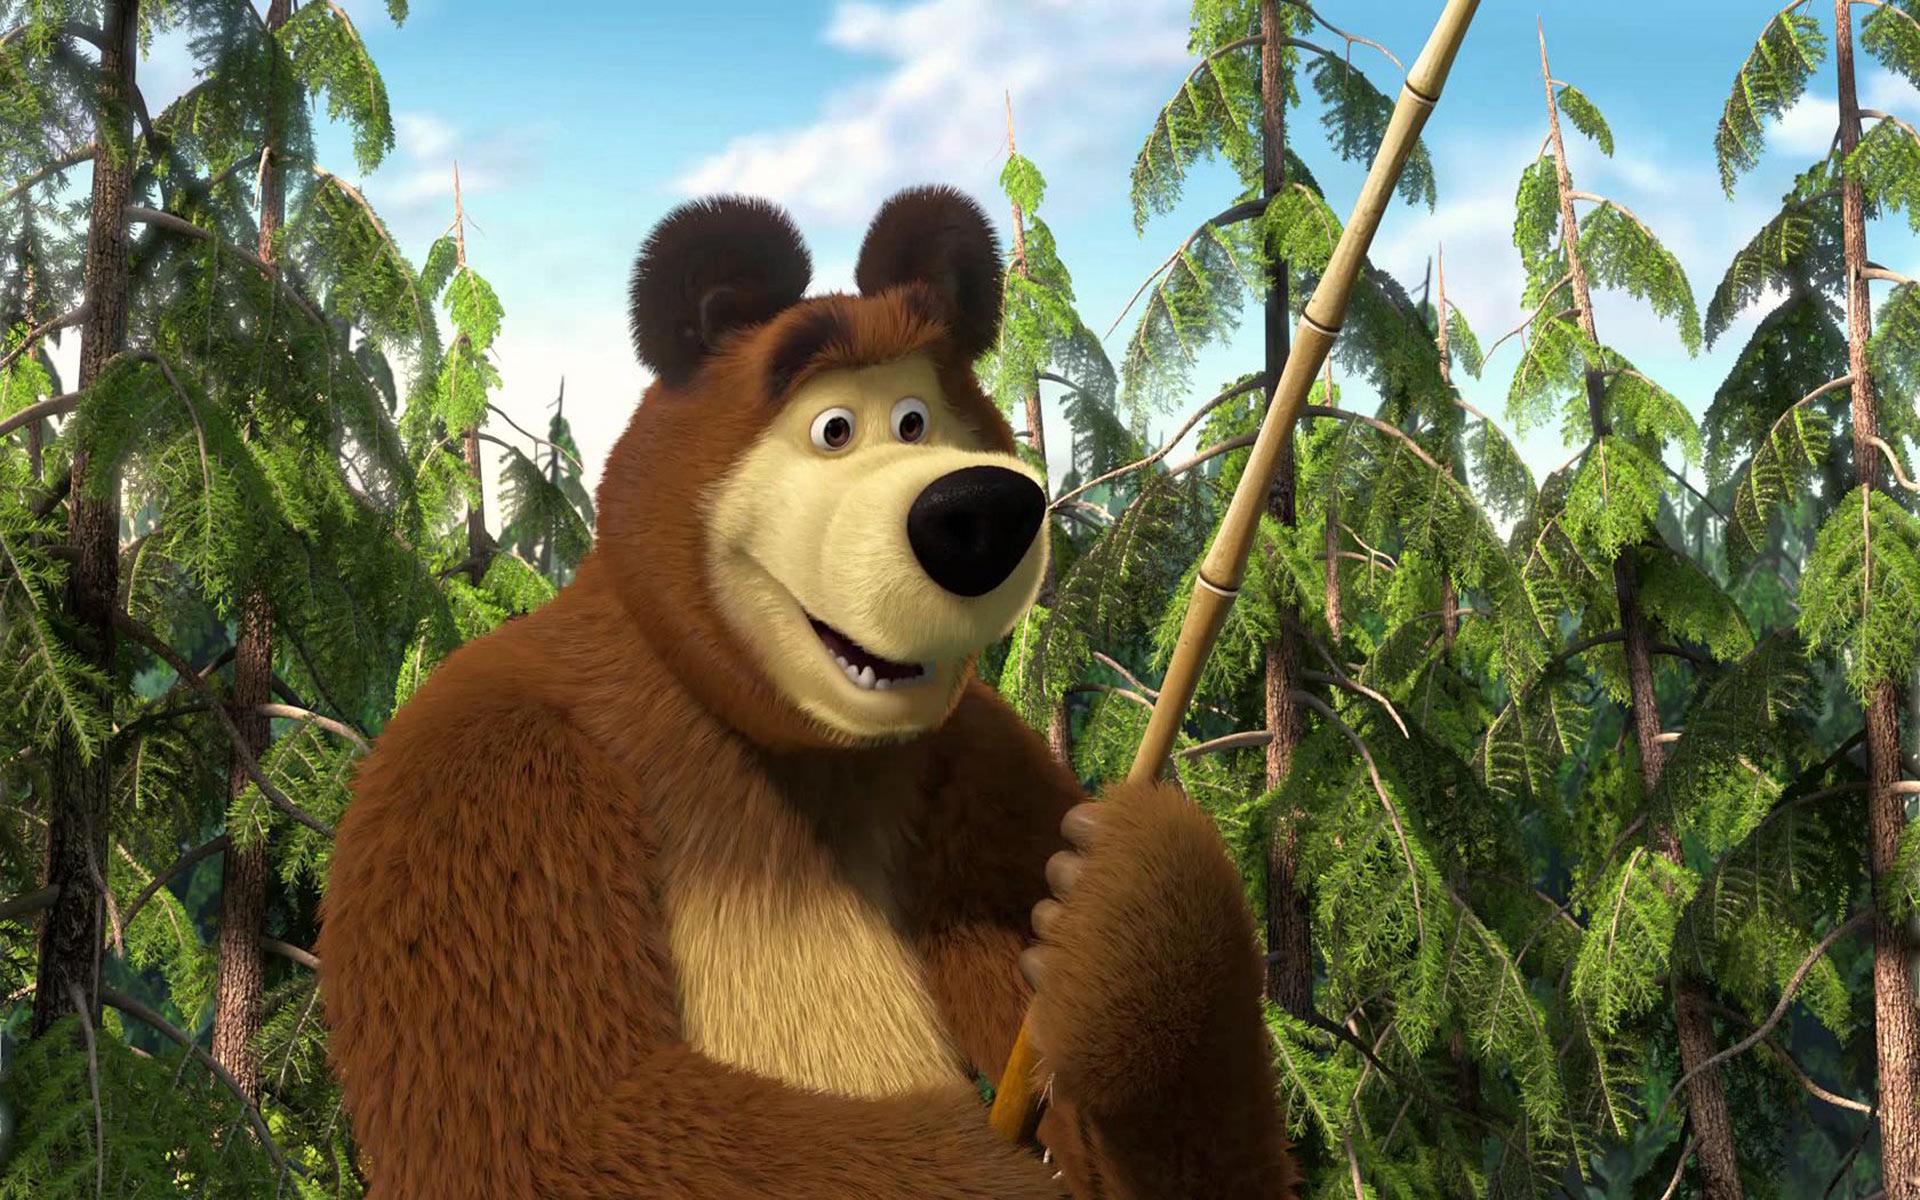 19 Hd Masha And The Bear Wallpapers